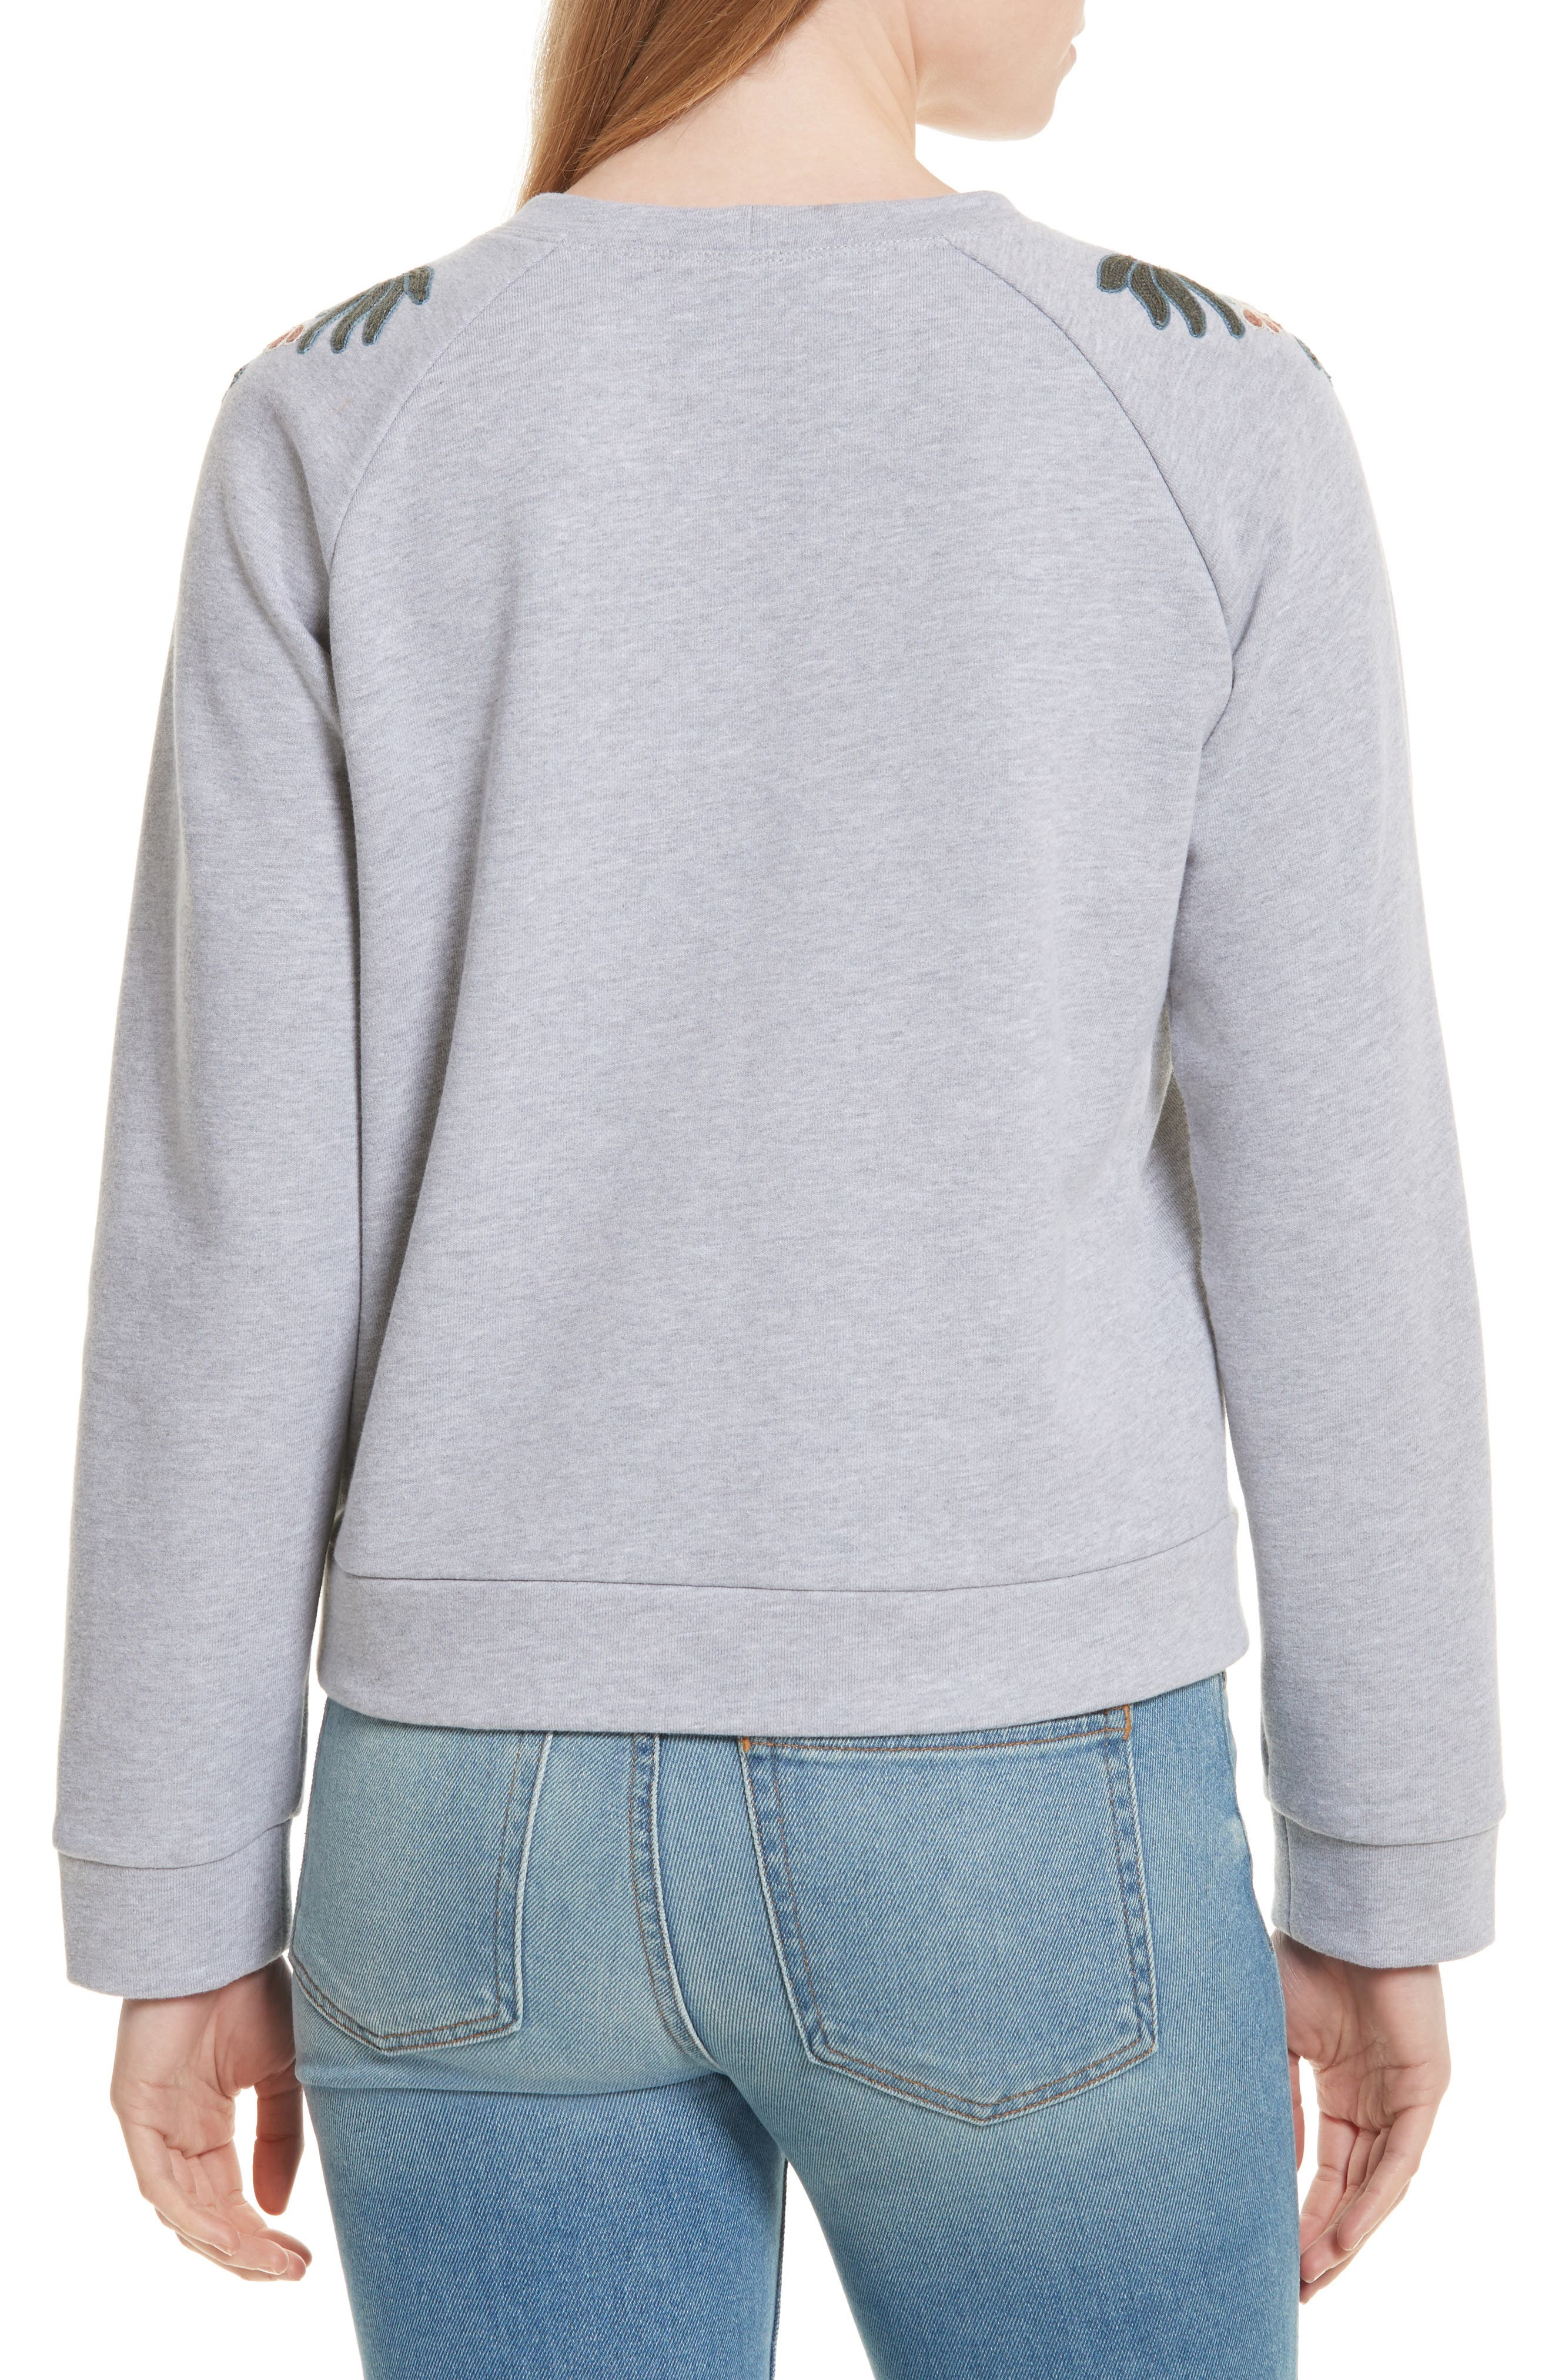 Jennings Embroidered Sweatshirt,                             Alternate thumbnail 2, color,                             Heather Grey